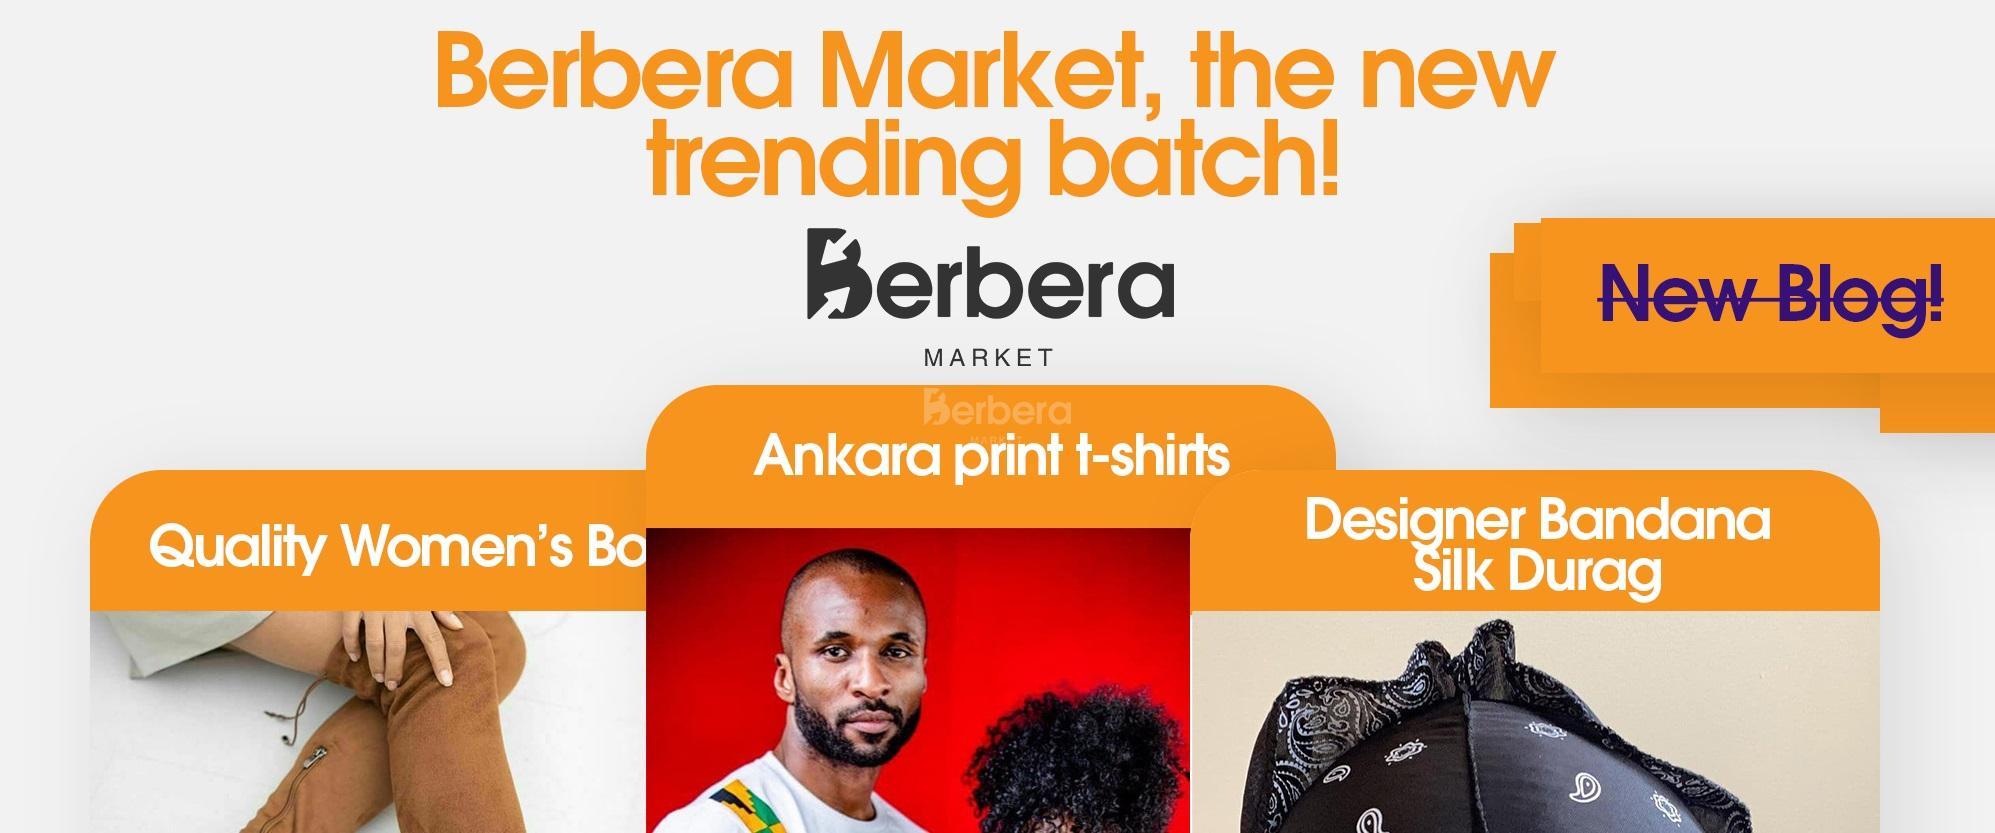 BERBERA MARKET, THE NEW TRENDING BATCH!